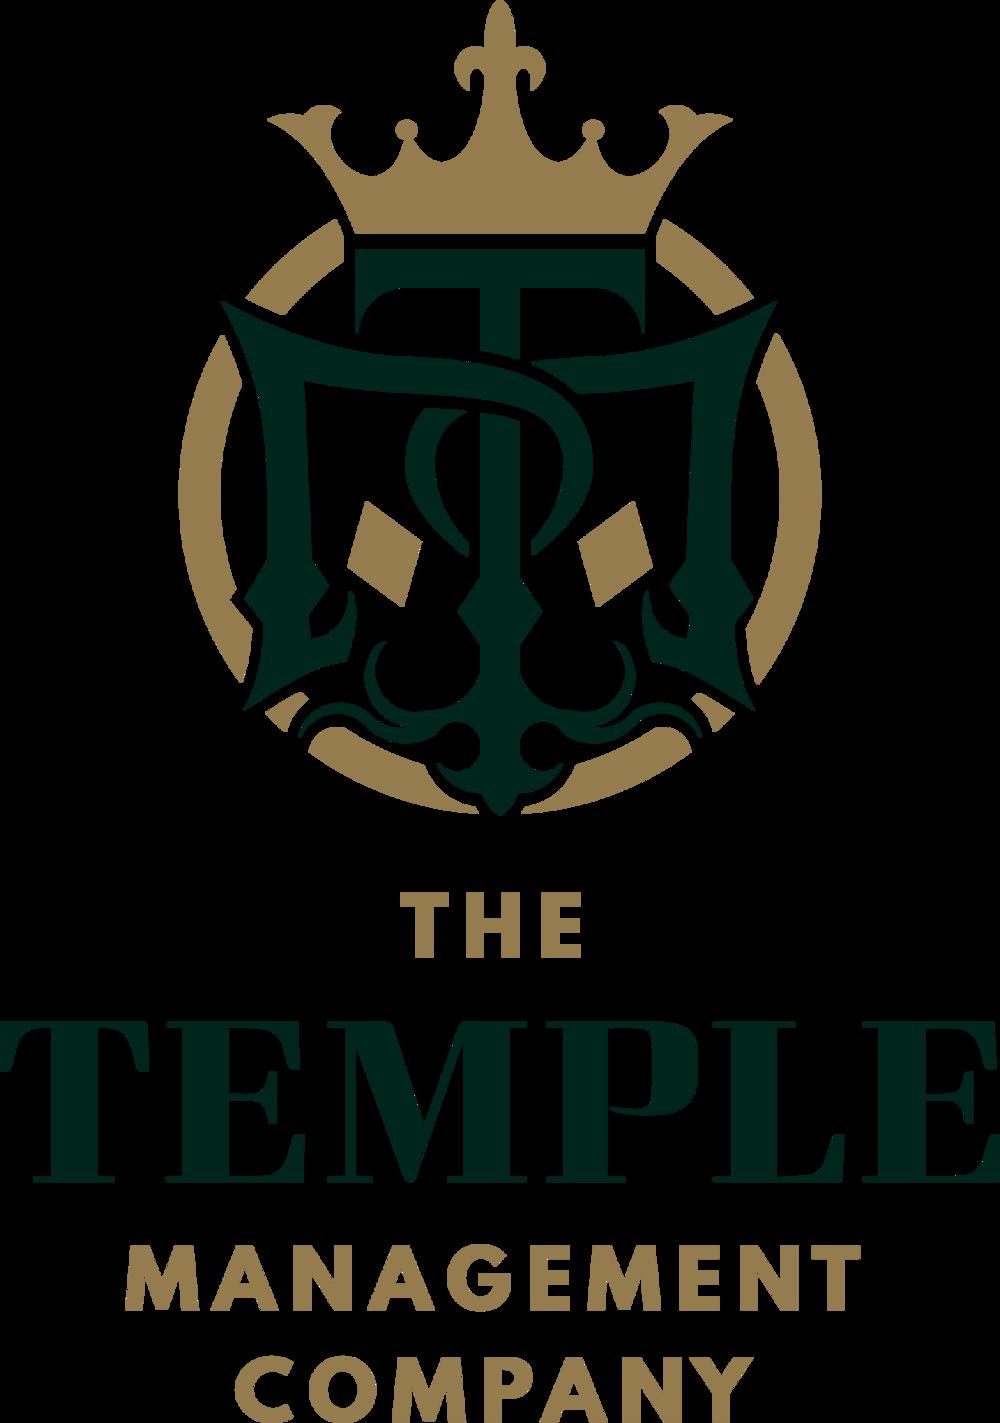 TempleLogo_WhiteBG.png